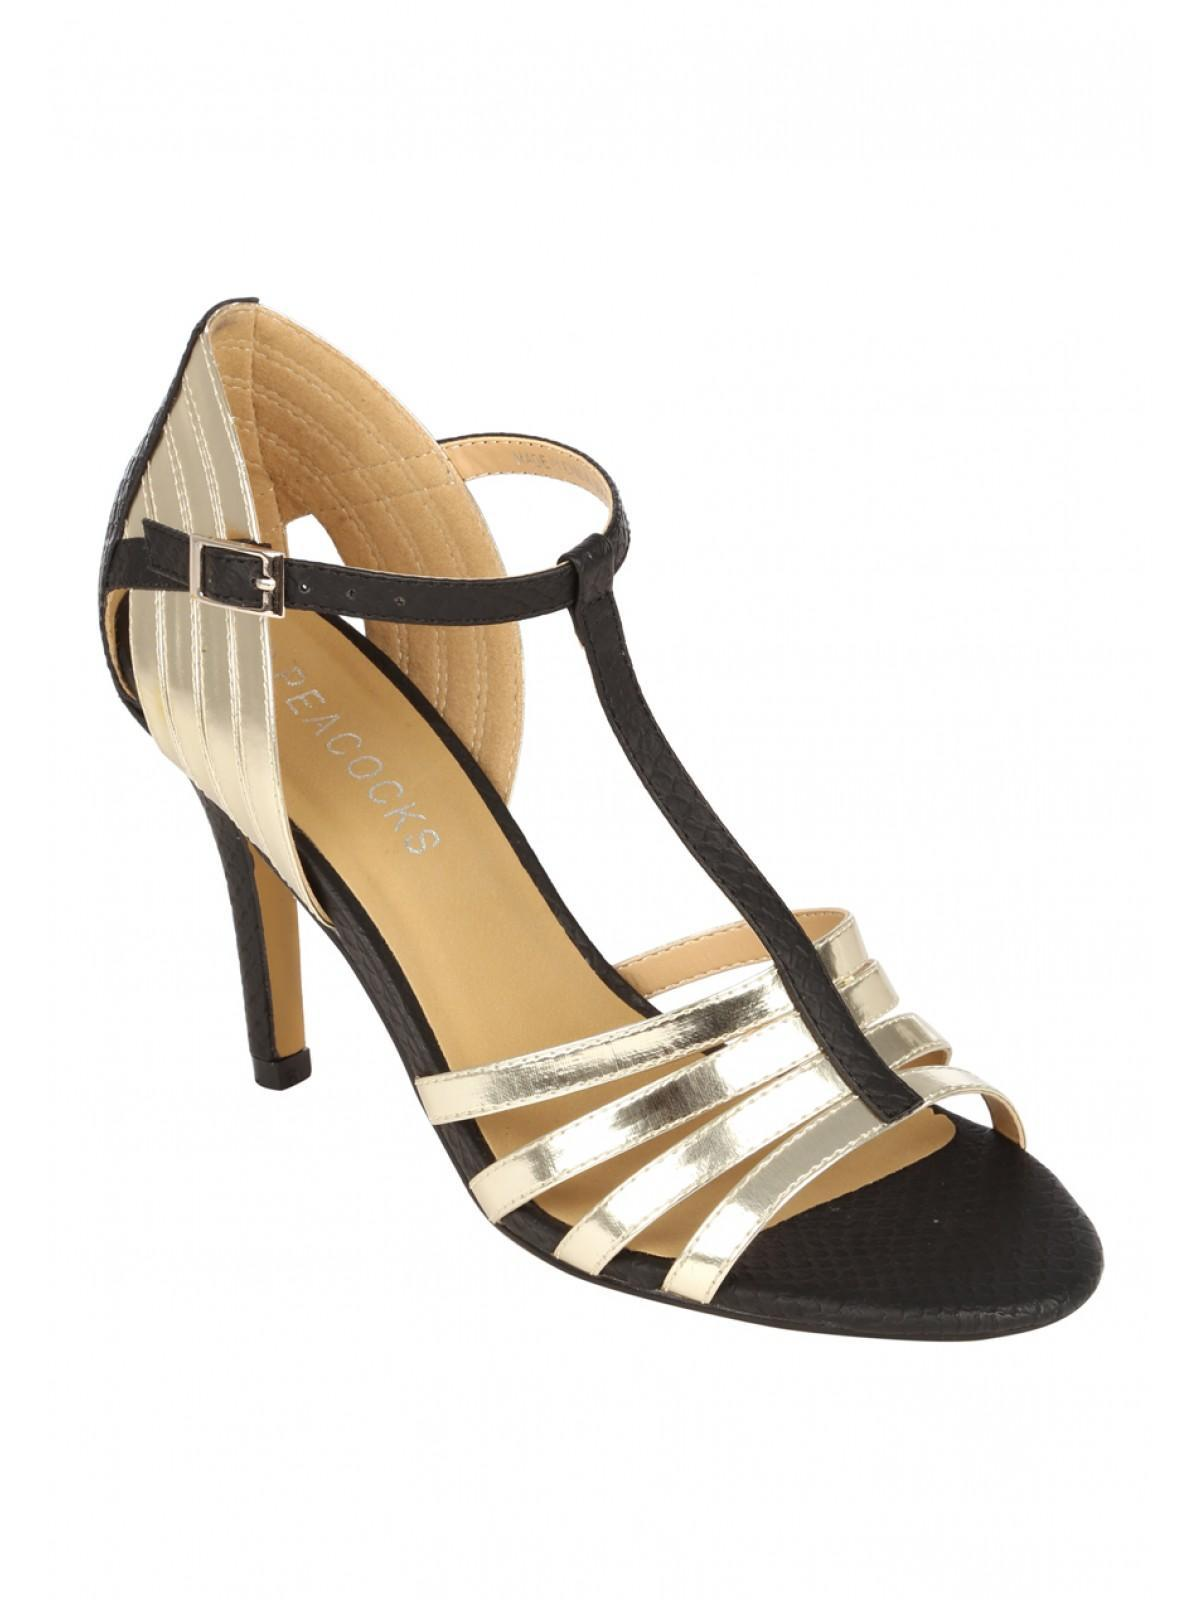 Black sandals gold bar - Black Sandals Gold Bar 10